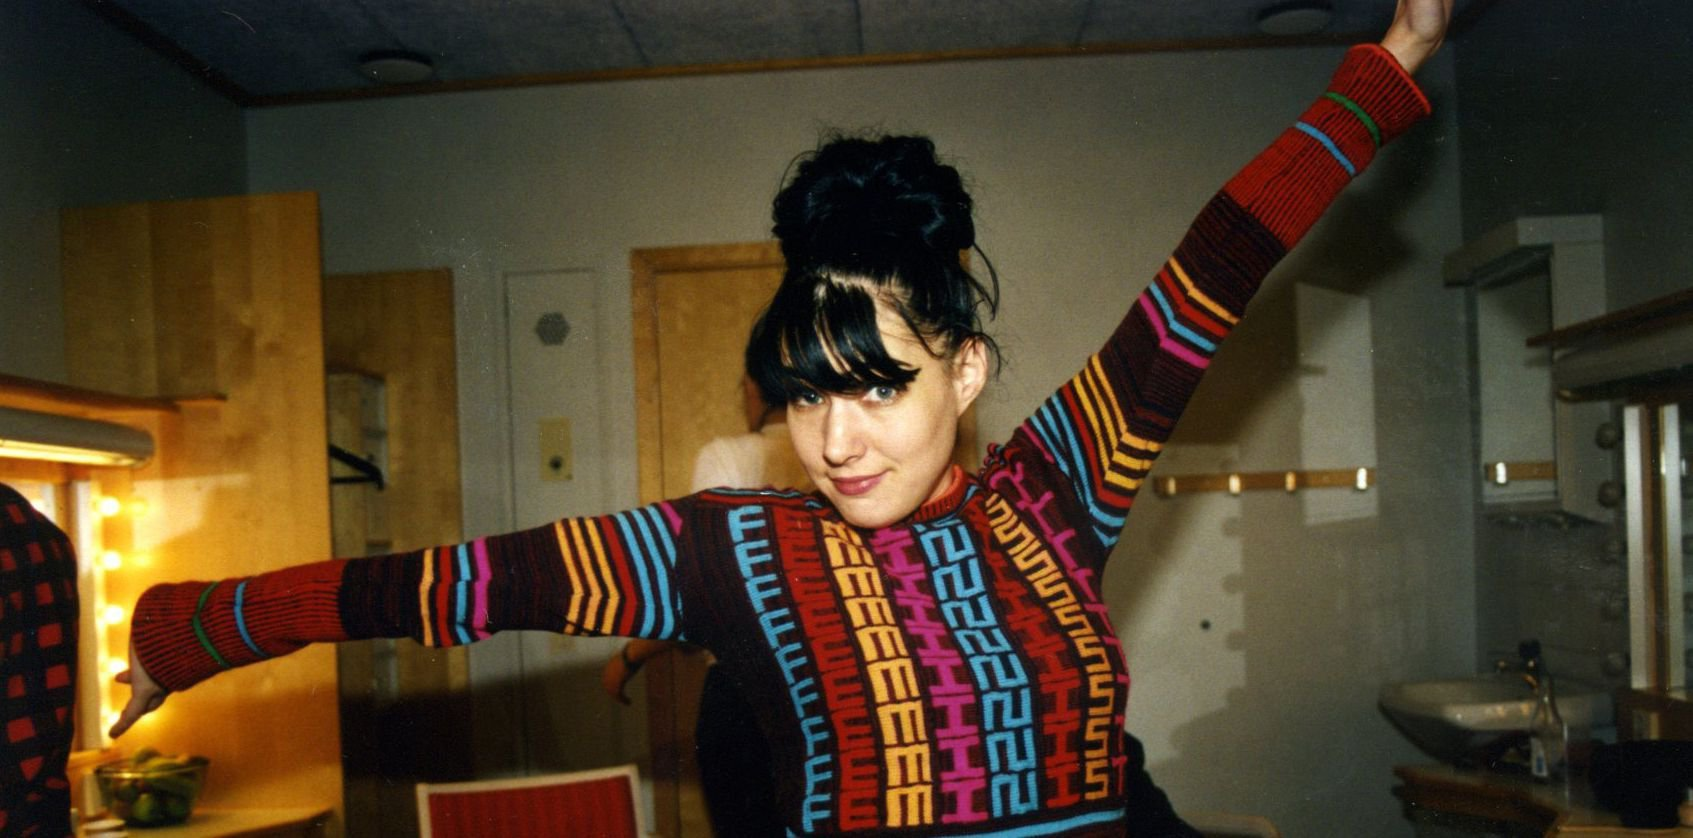 b123ecb03 Review: The Punk Singer - Slant Magazine